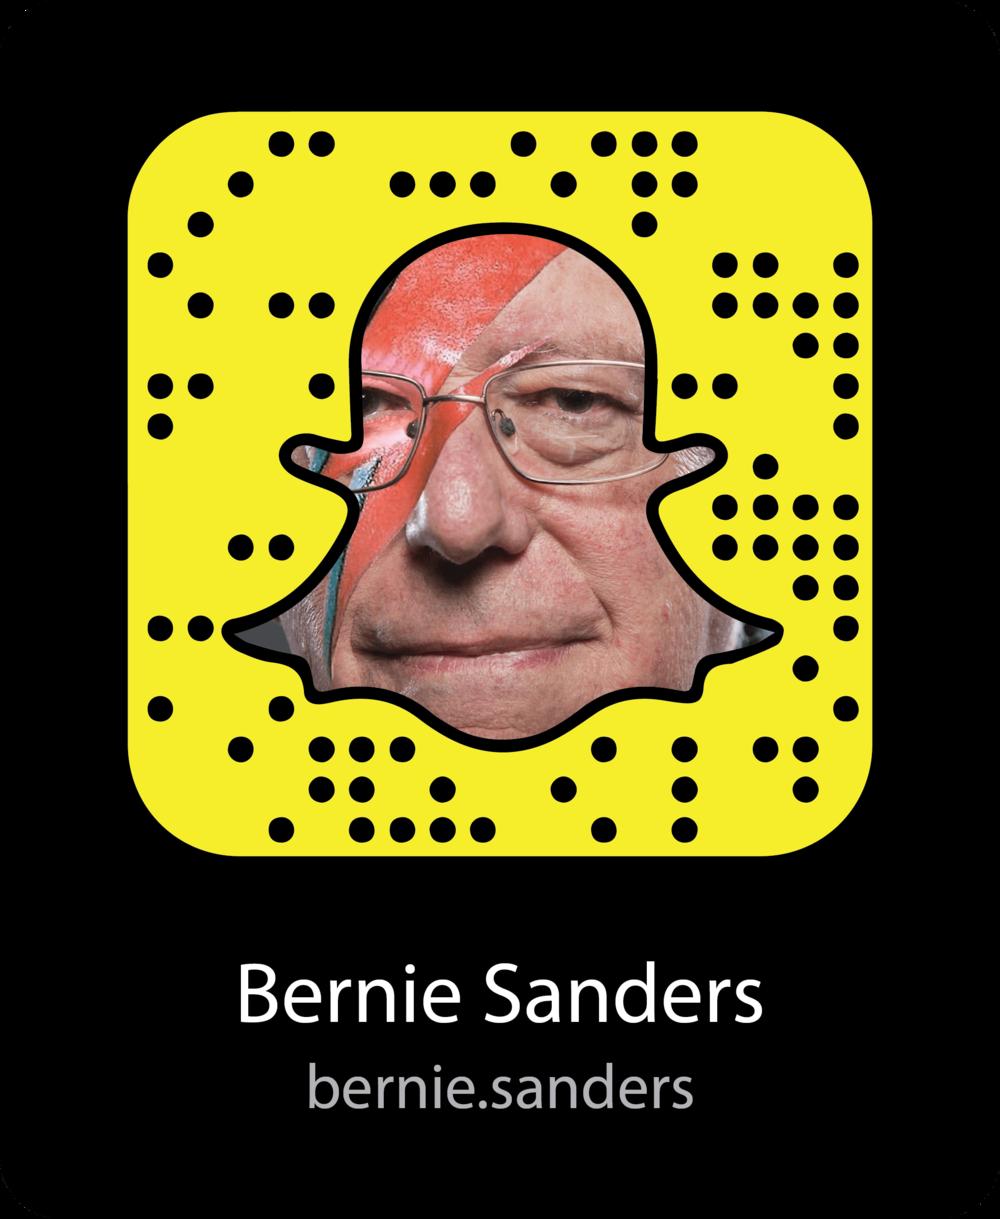 bernie-sanders-election-snapchat-snapcode